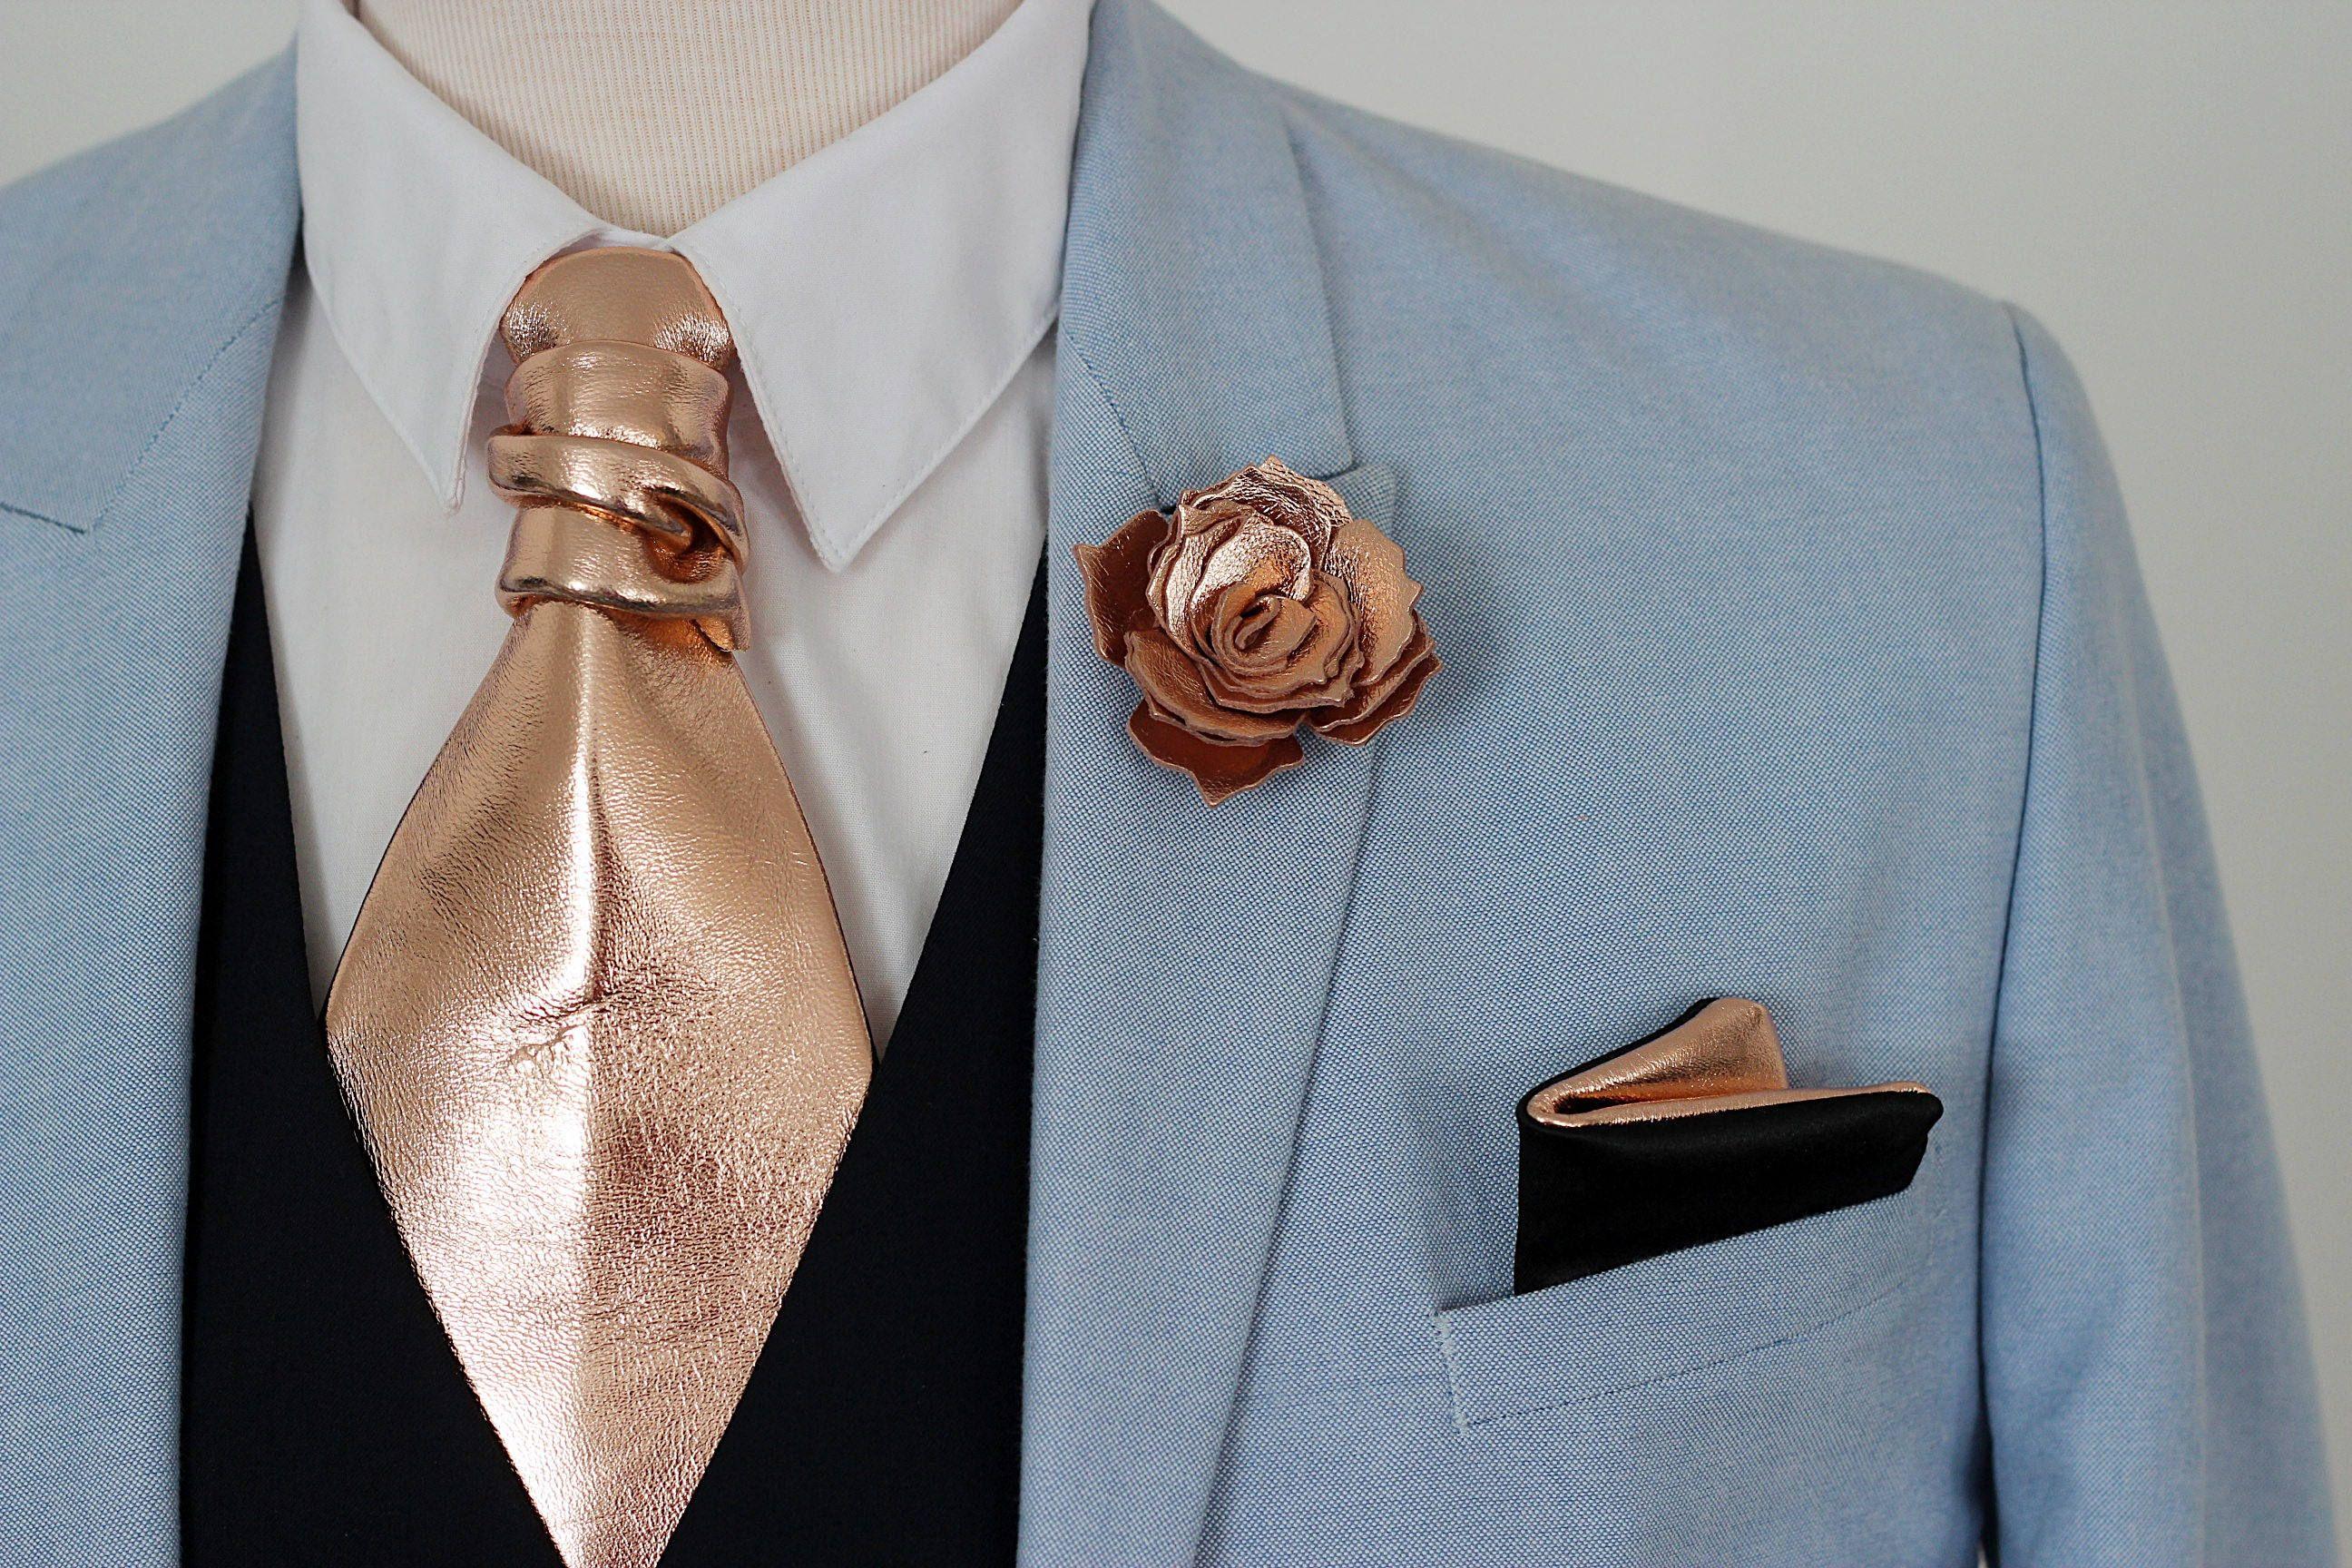 Handmade Rose Gold Satin Boys Tie Childrens Tie Boys Wedding Tie Prom Tie